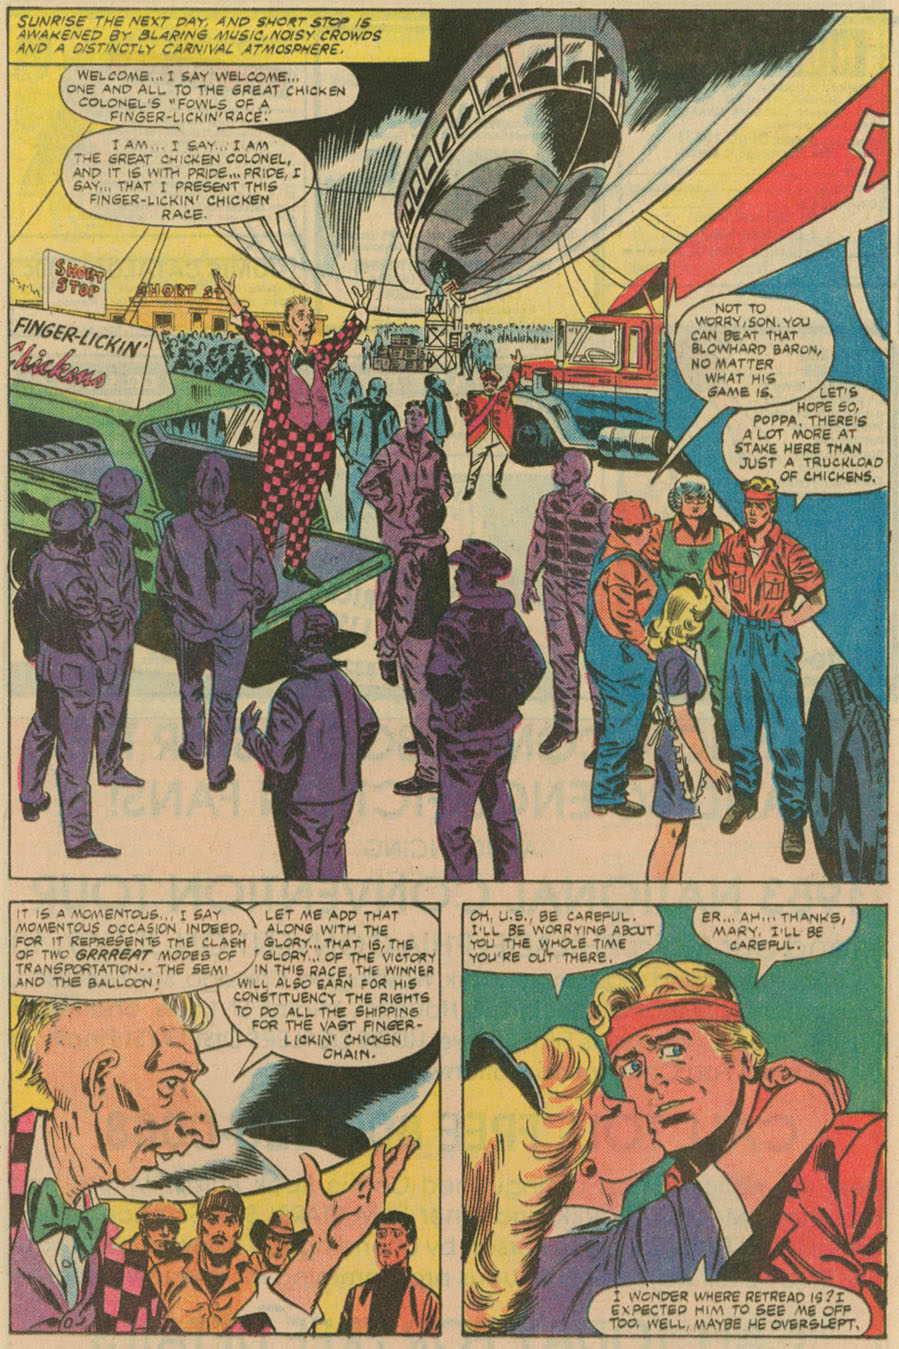 Read online U.S. 1 comic -  Issue #4 - 10